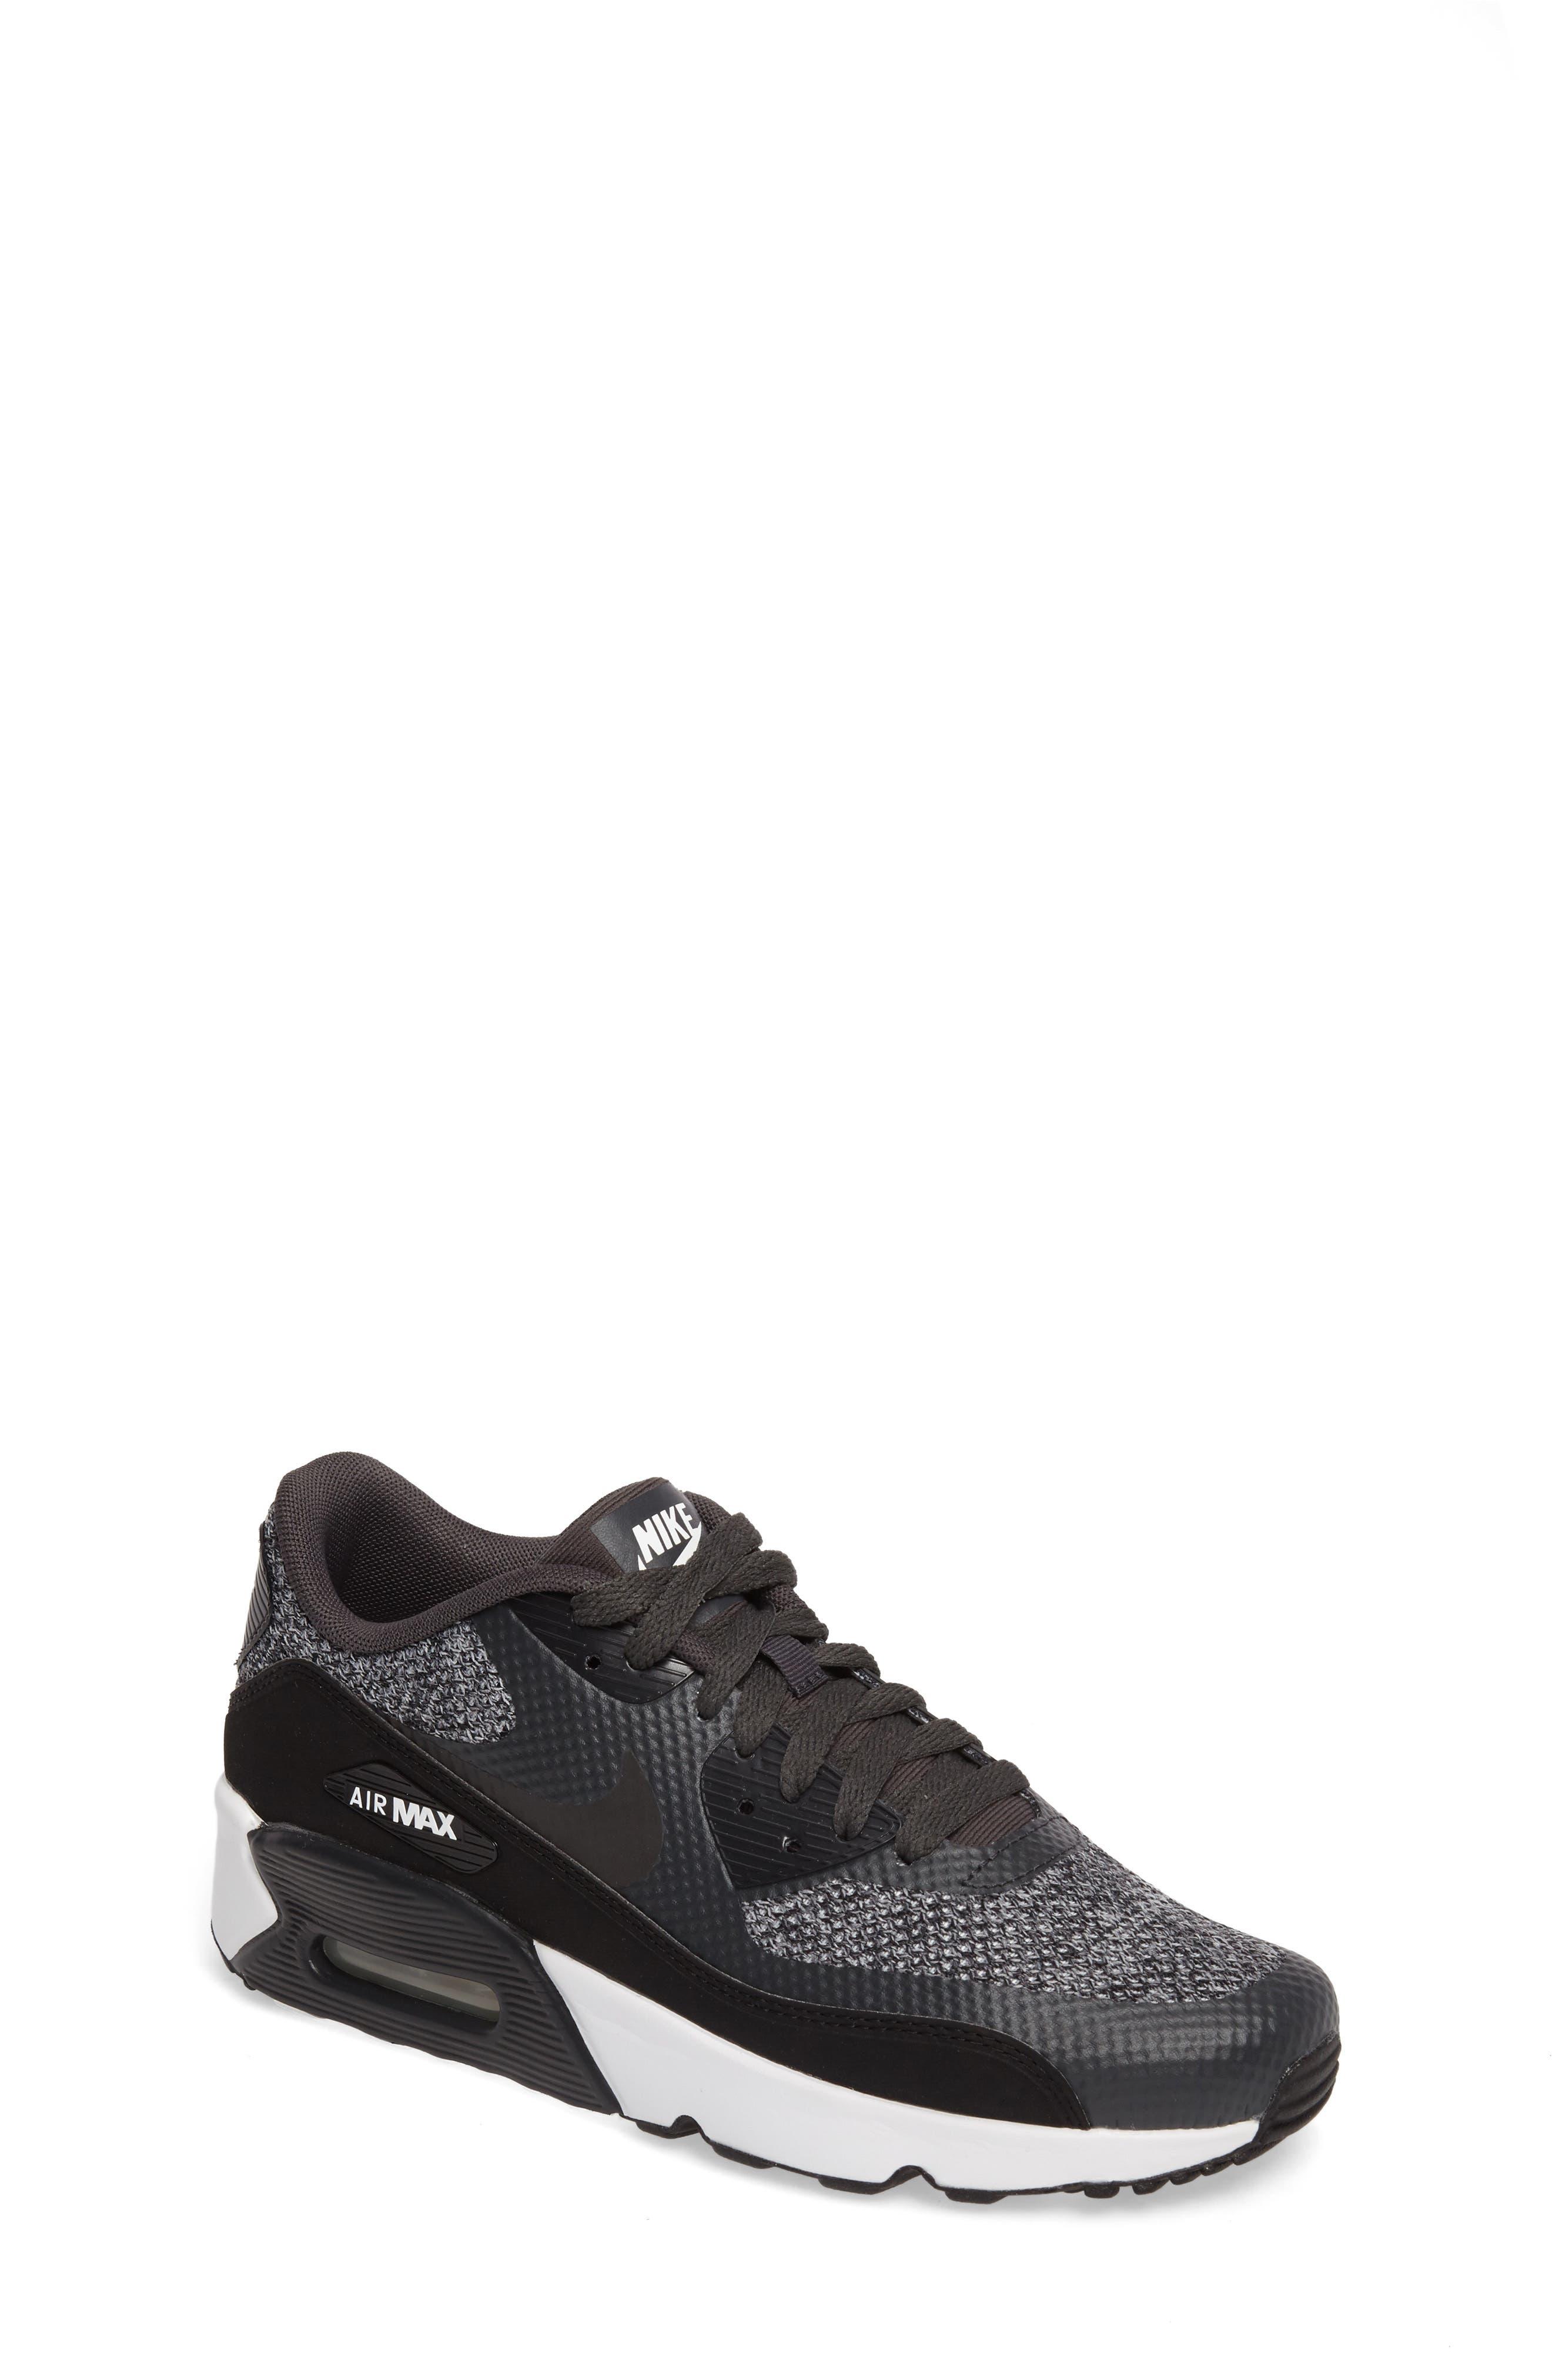 Air Max 90 Ultra 2.0 SE Sneaker,                         Main,                         color, Anthracite/ Black